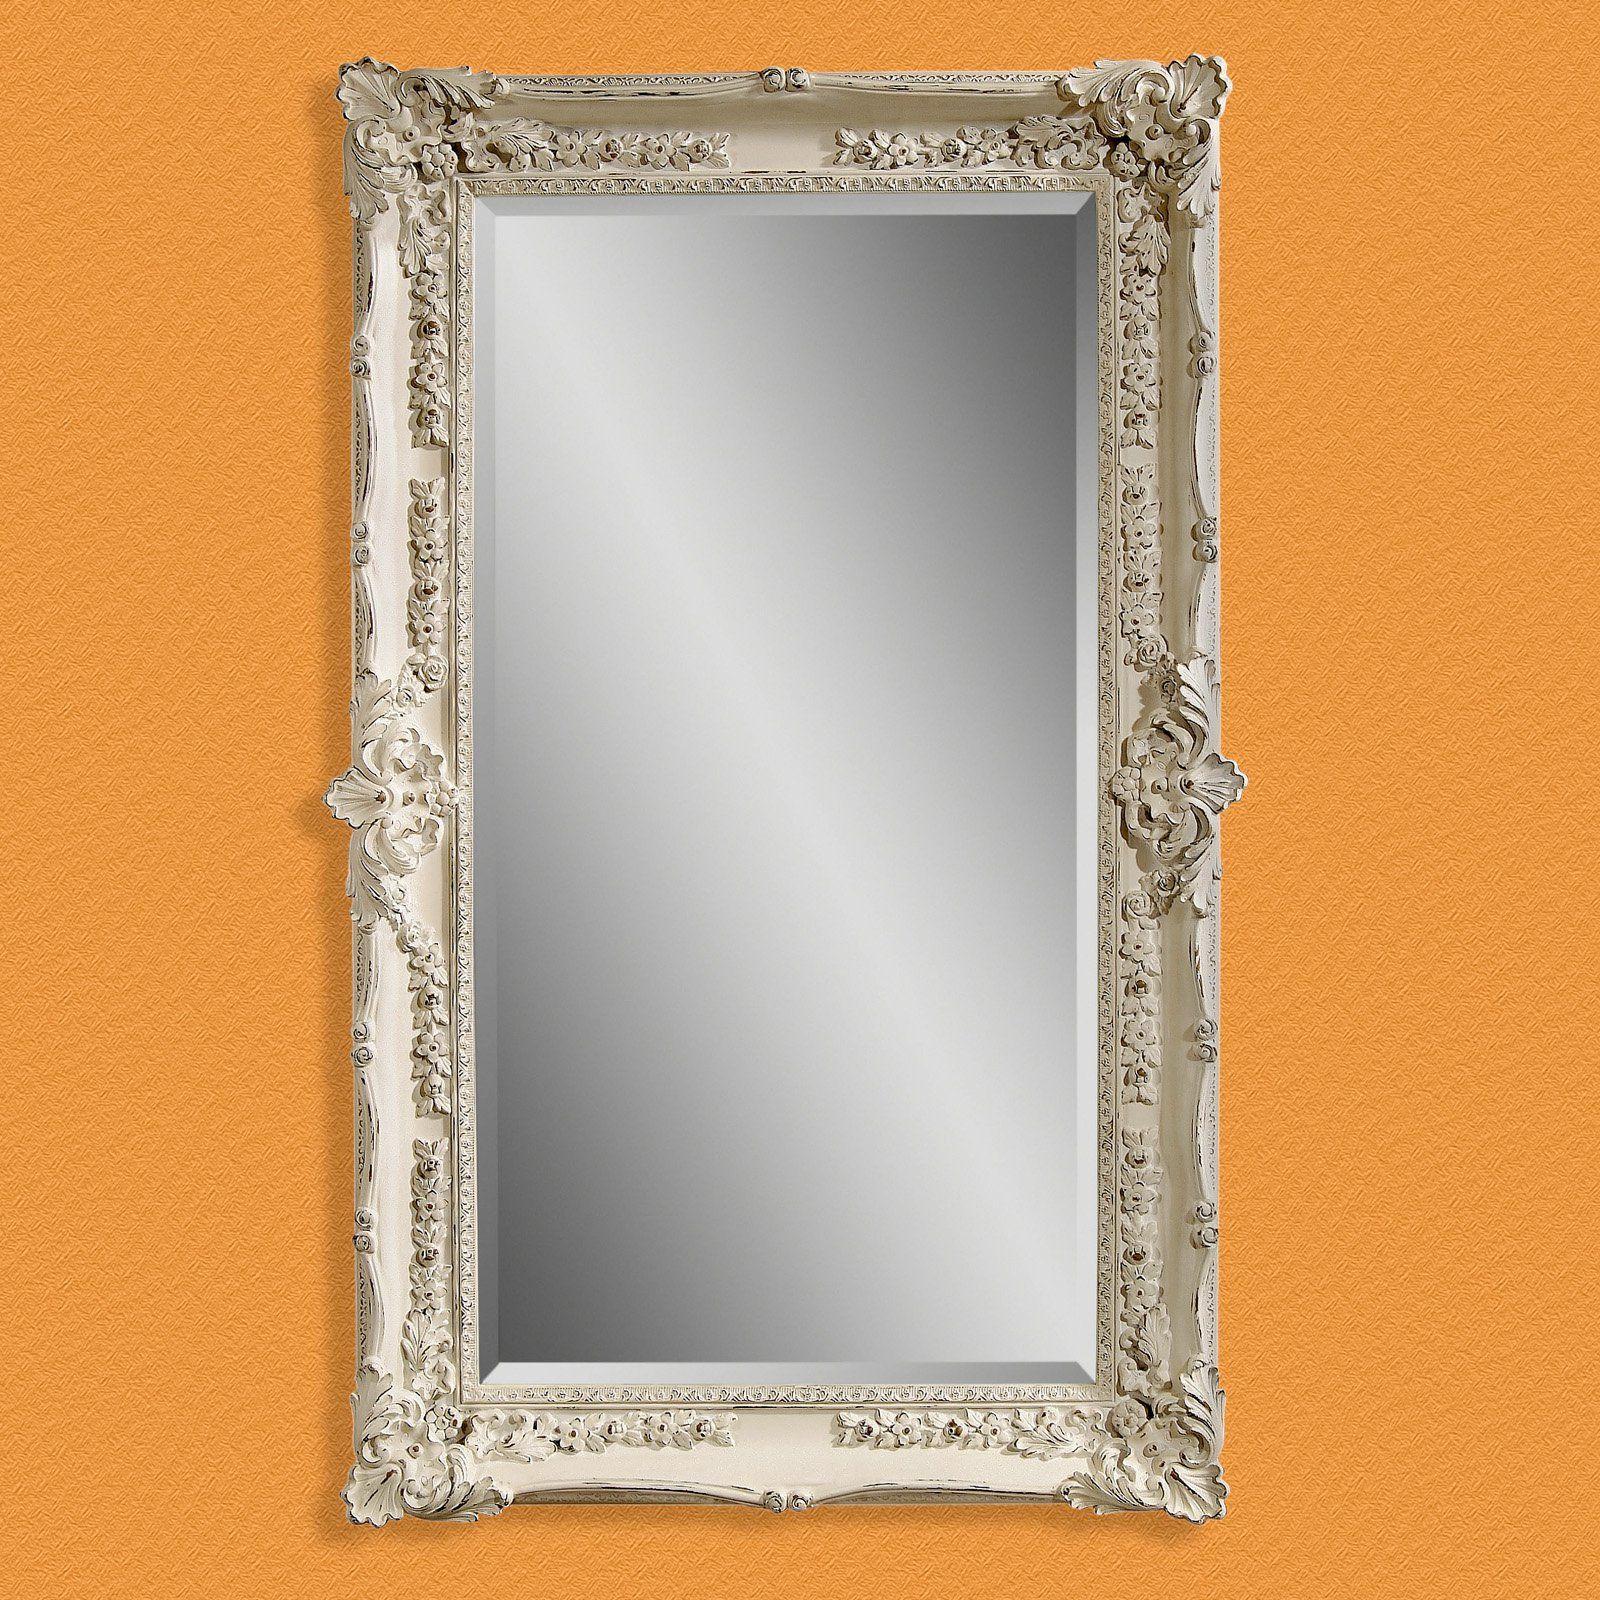 White leaning floor mirror white leaning floor mirror a bgbc white leaning floor mirror antique white wall leaning floor mirror 43w x 69h dailygadgetfo Gallery